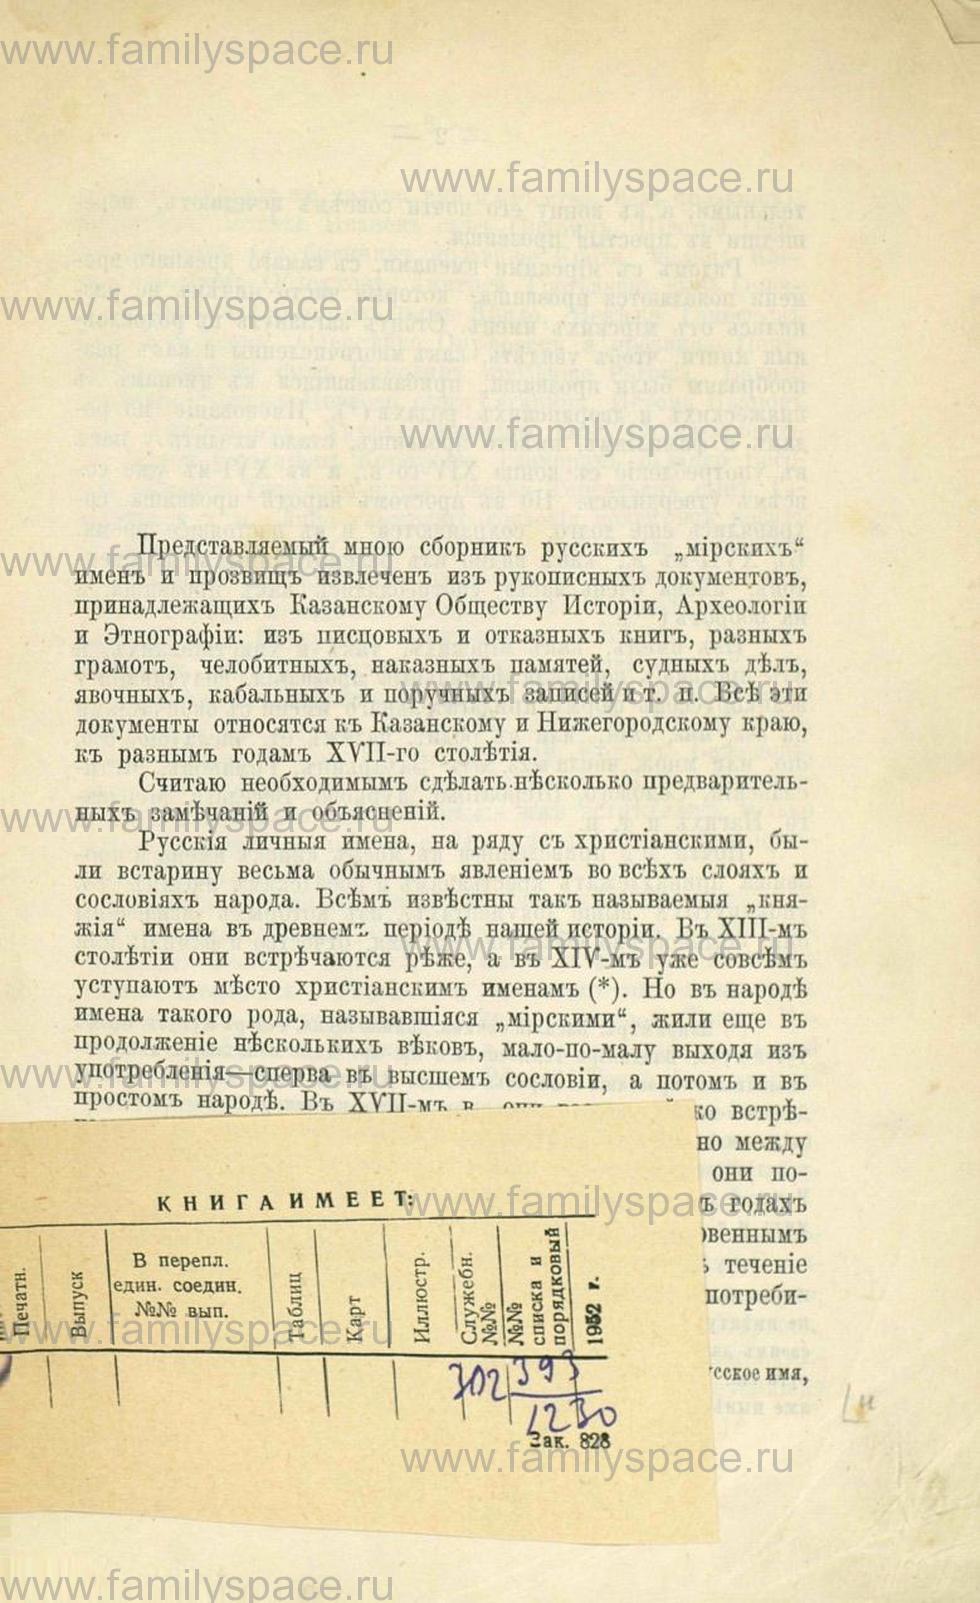 Поиск по фамилии - Русские имена и прозвища в 17 веке, страница 4